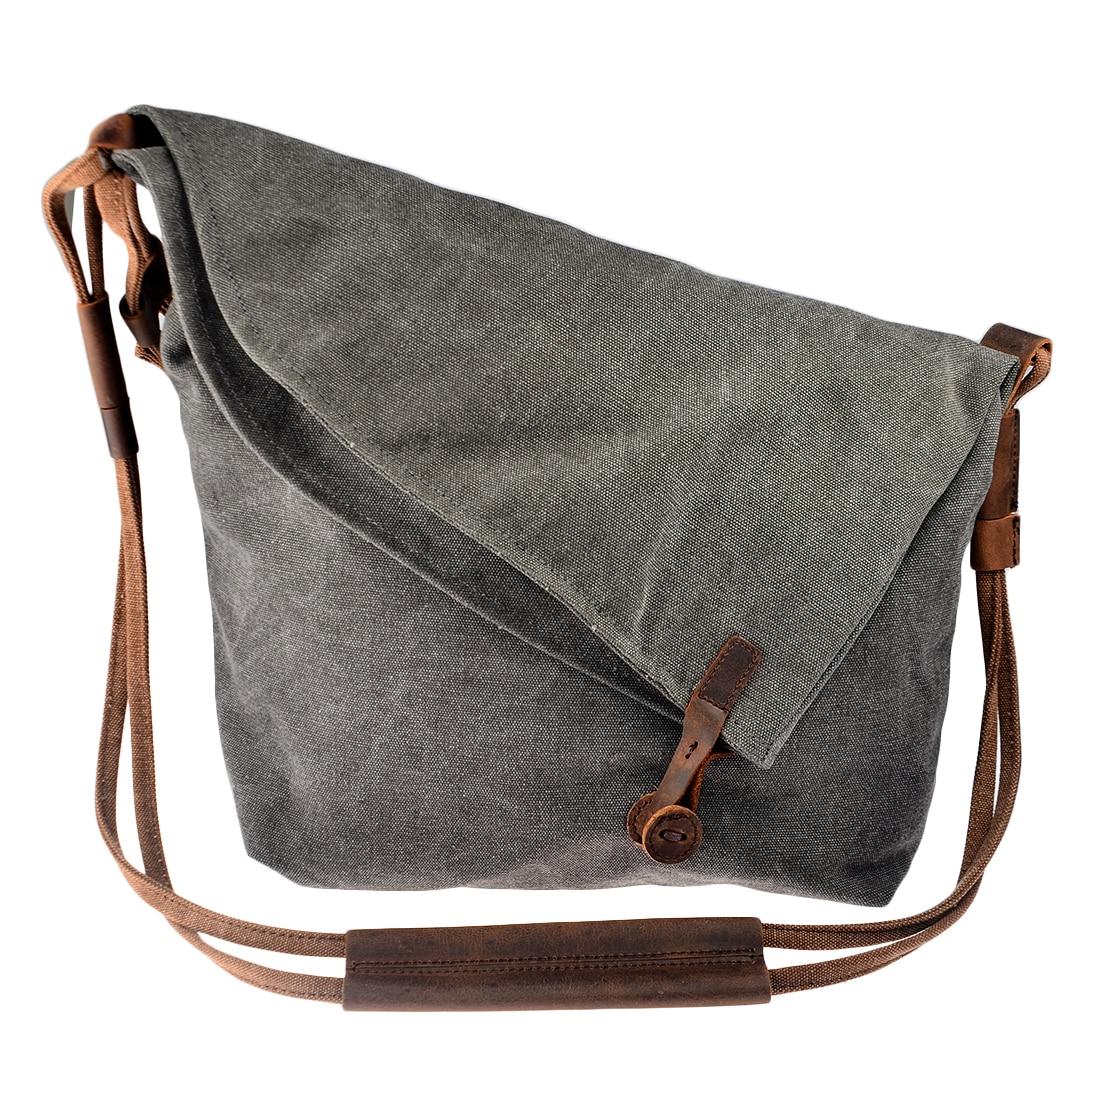 727c4f5e79ef Best Women Bag Cross Body Vintage Casual Crazy Horse Leather Canvas Crossbody  Bags Messenger Shouder Bag Ladies Bolsa Feminina Girls Reviews